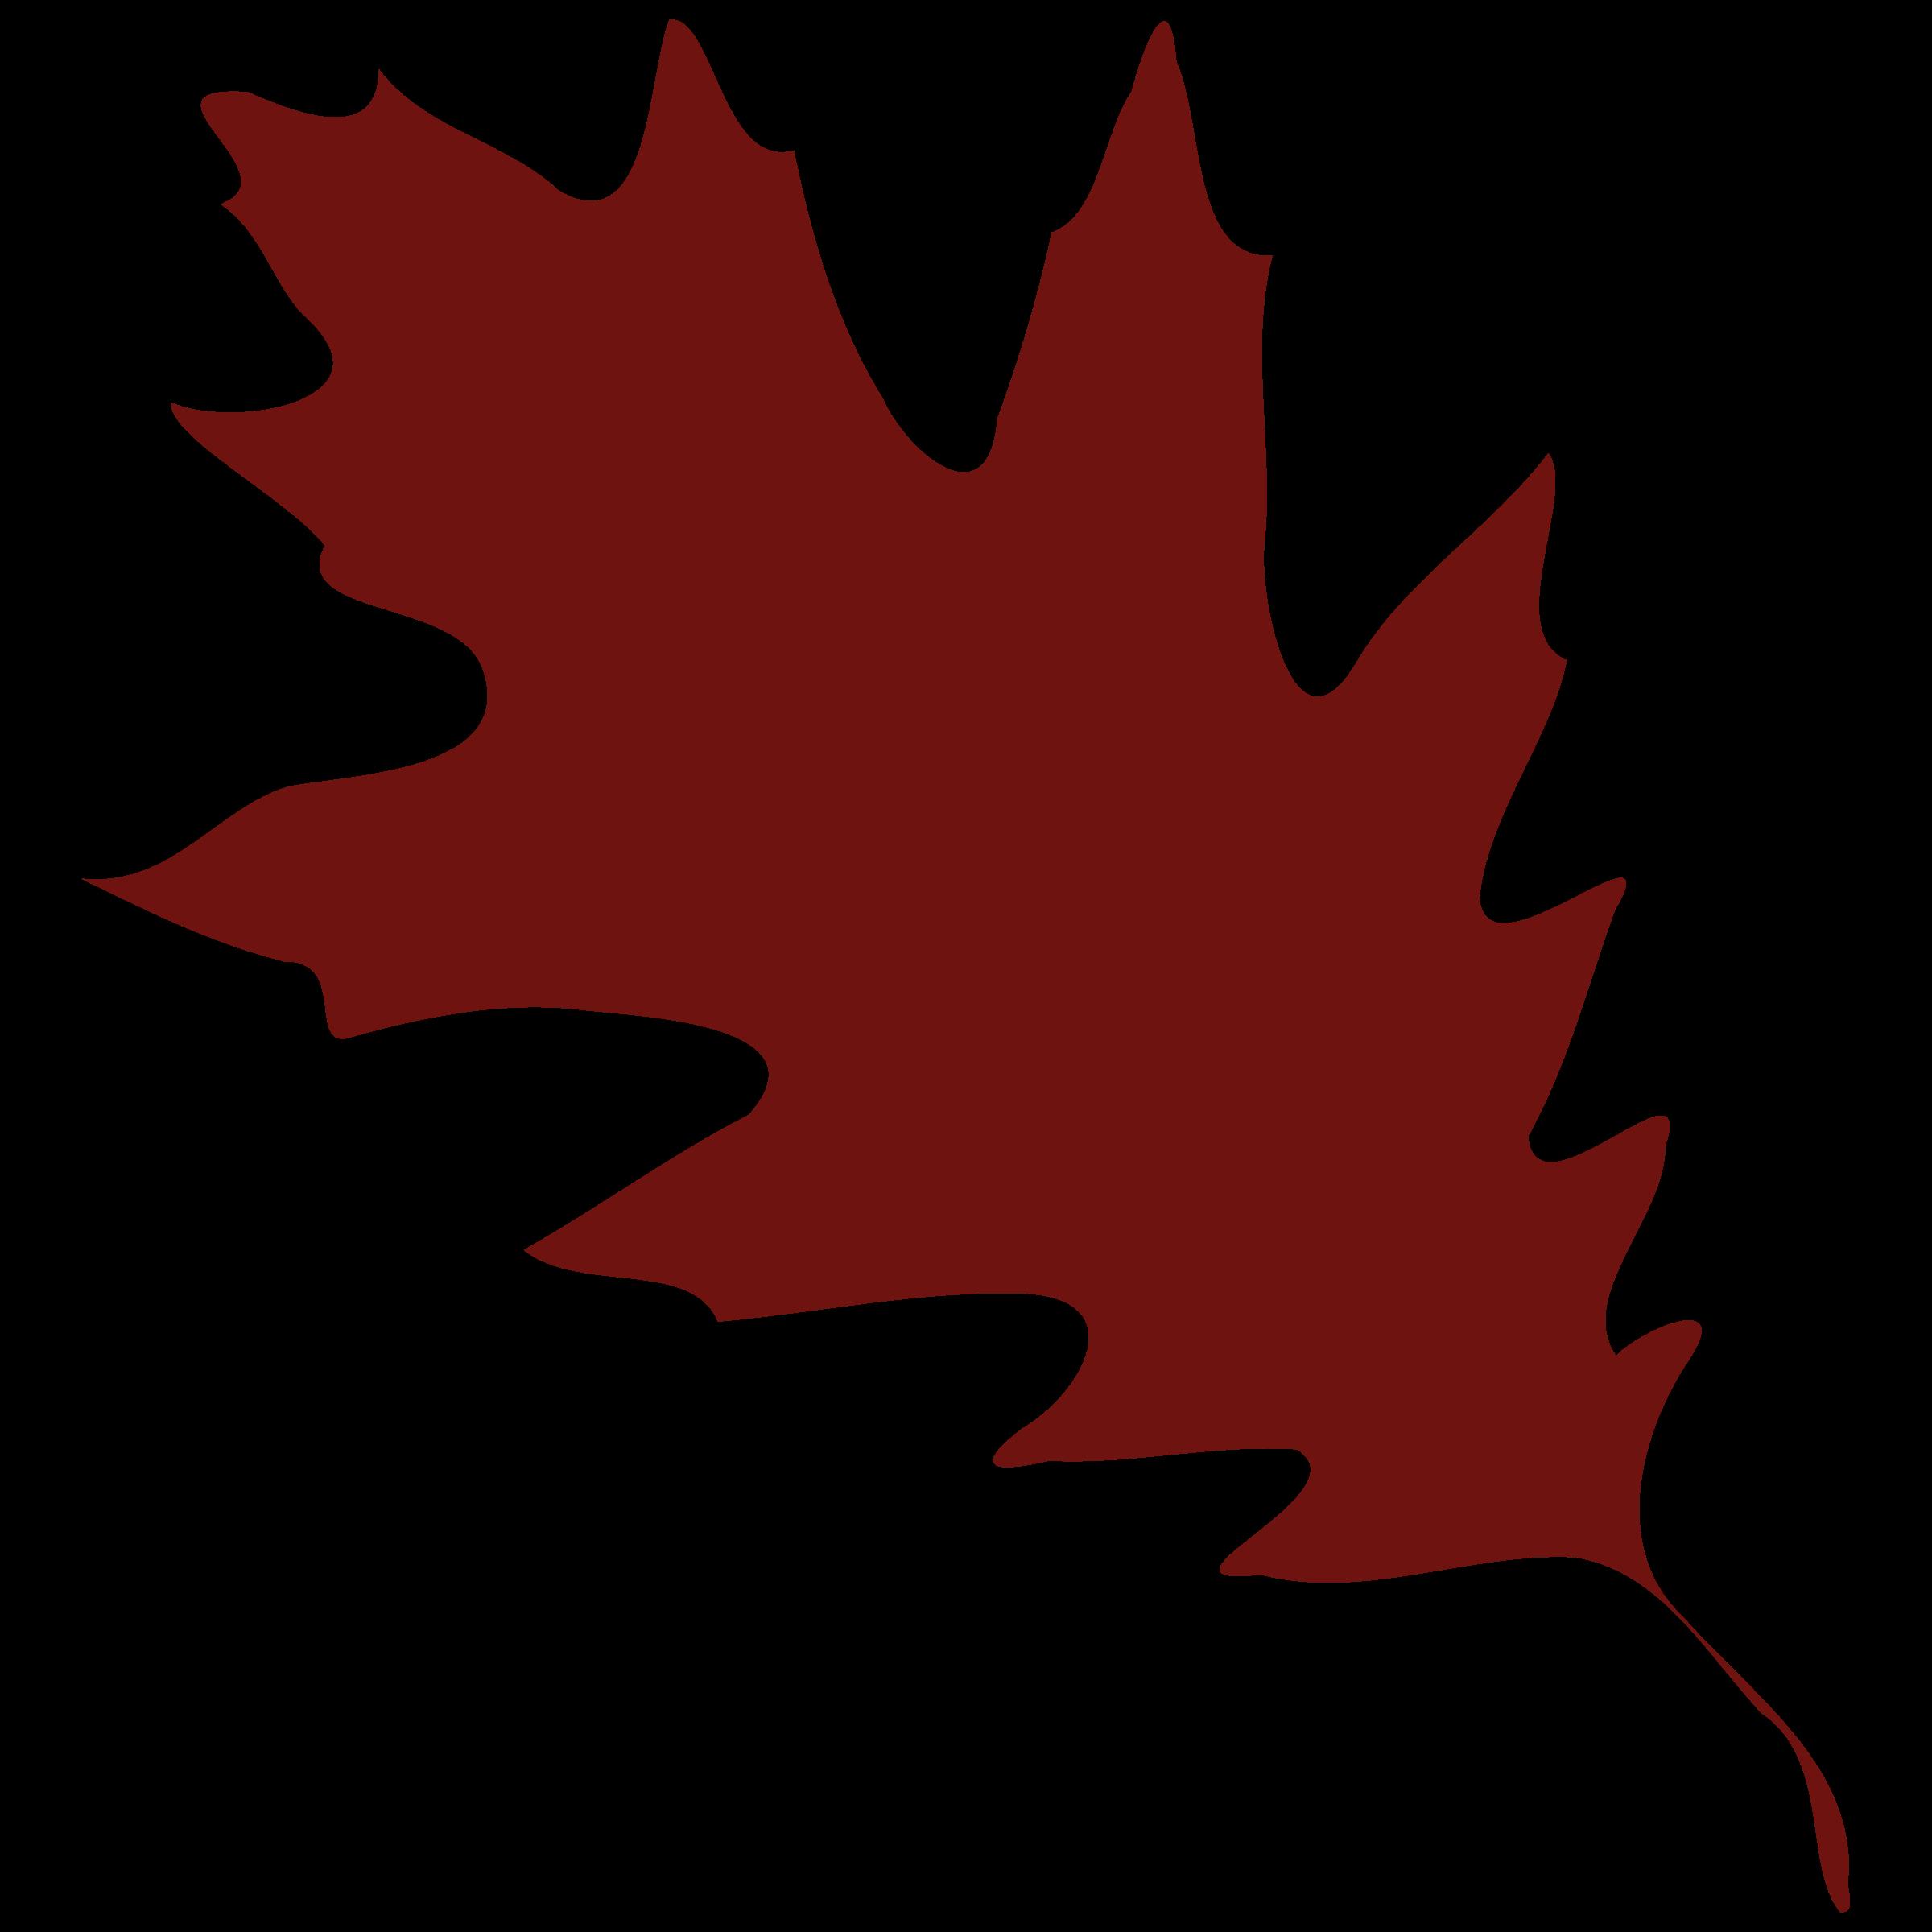 2400x2400 Fall Leaves Clip Art